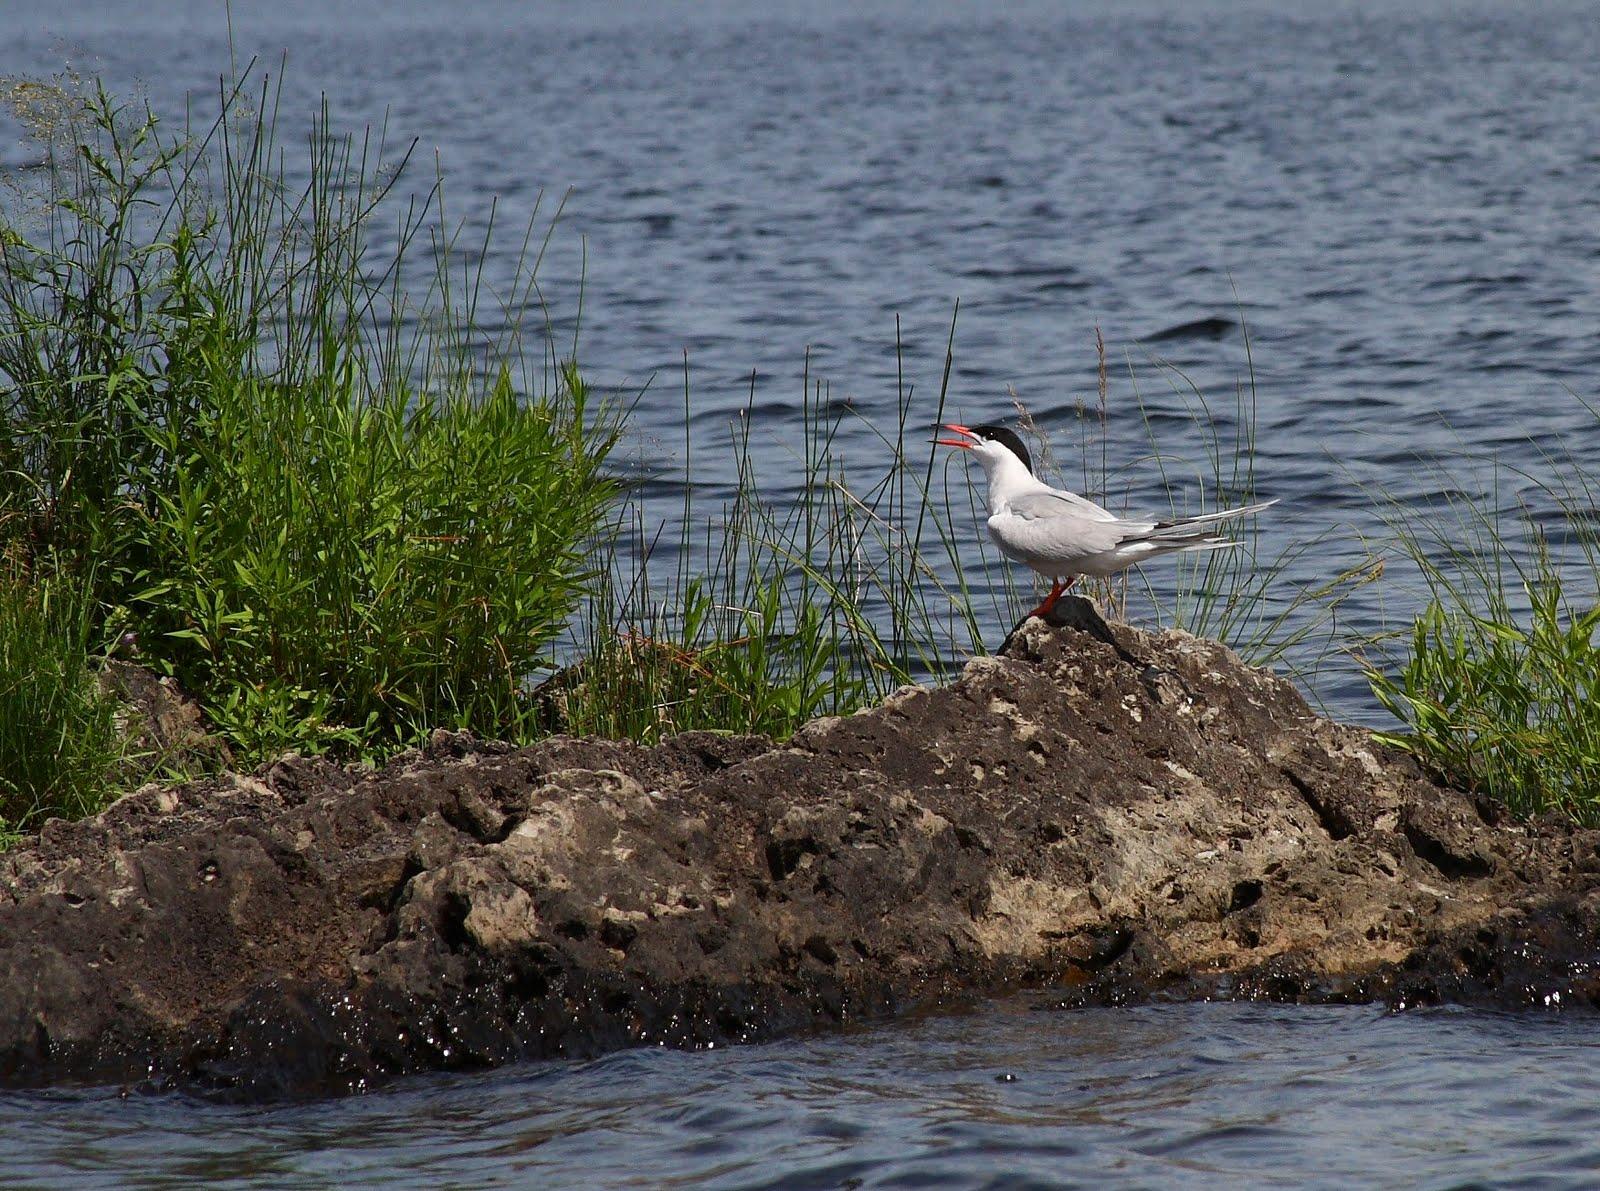 Northern maine birds fish river lake nesting larids for Maine freshwater fish